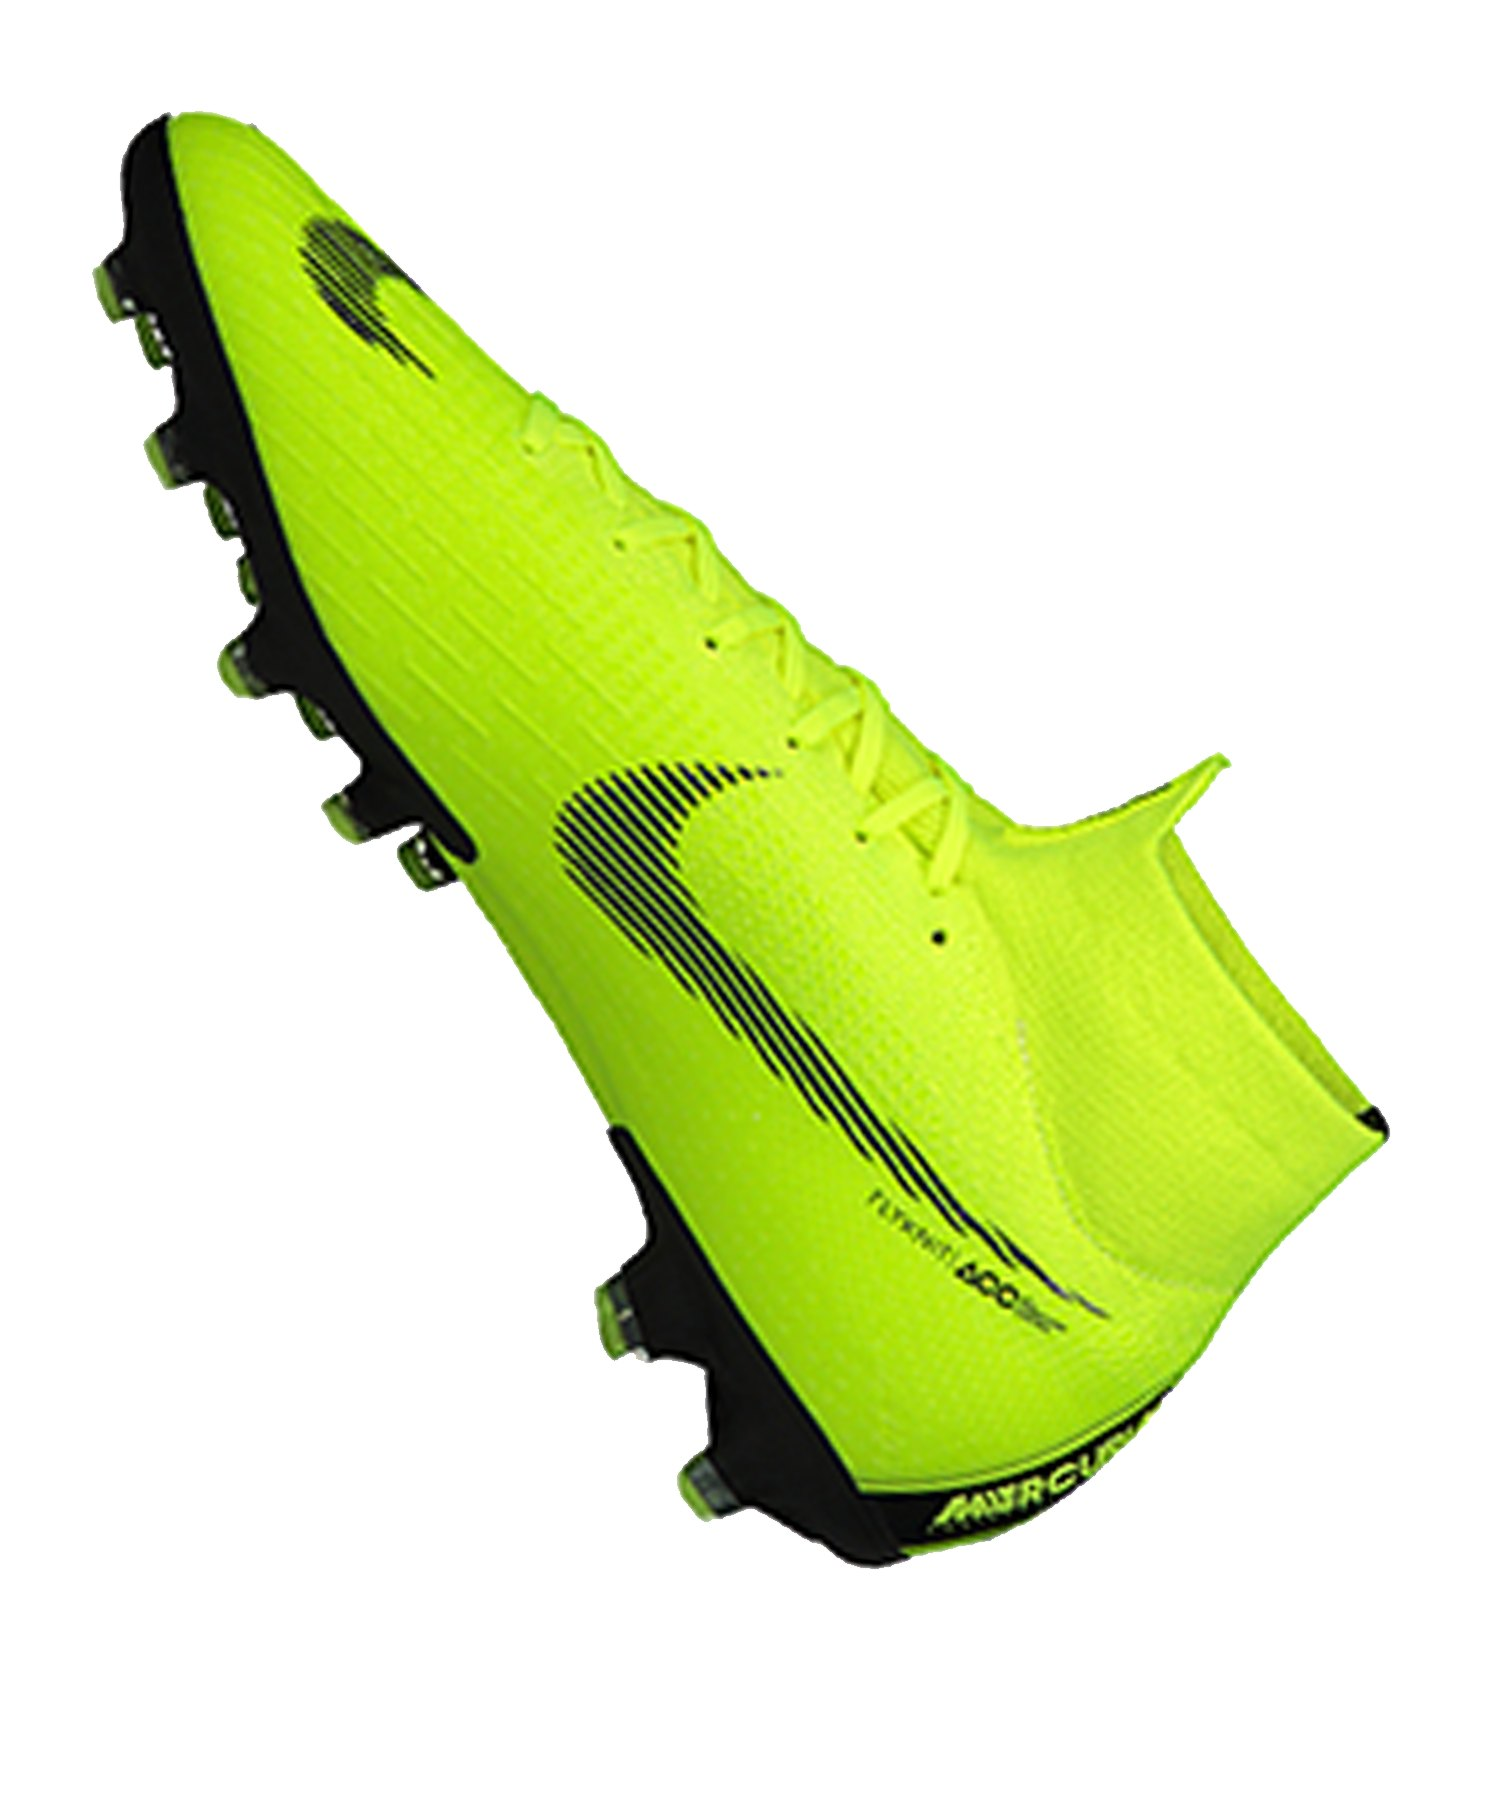 Elite Vi Superfly Pro Nike Ag F701 Mercurial hdtsBxQrC